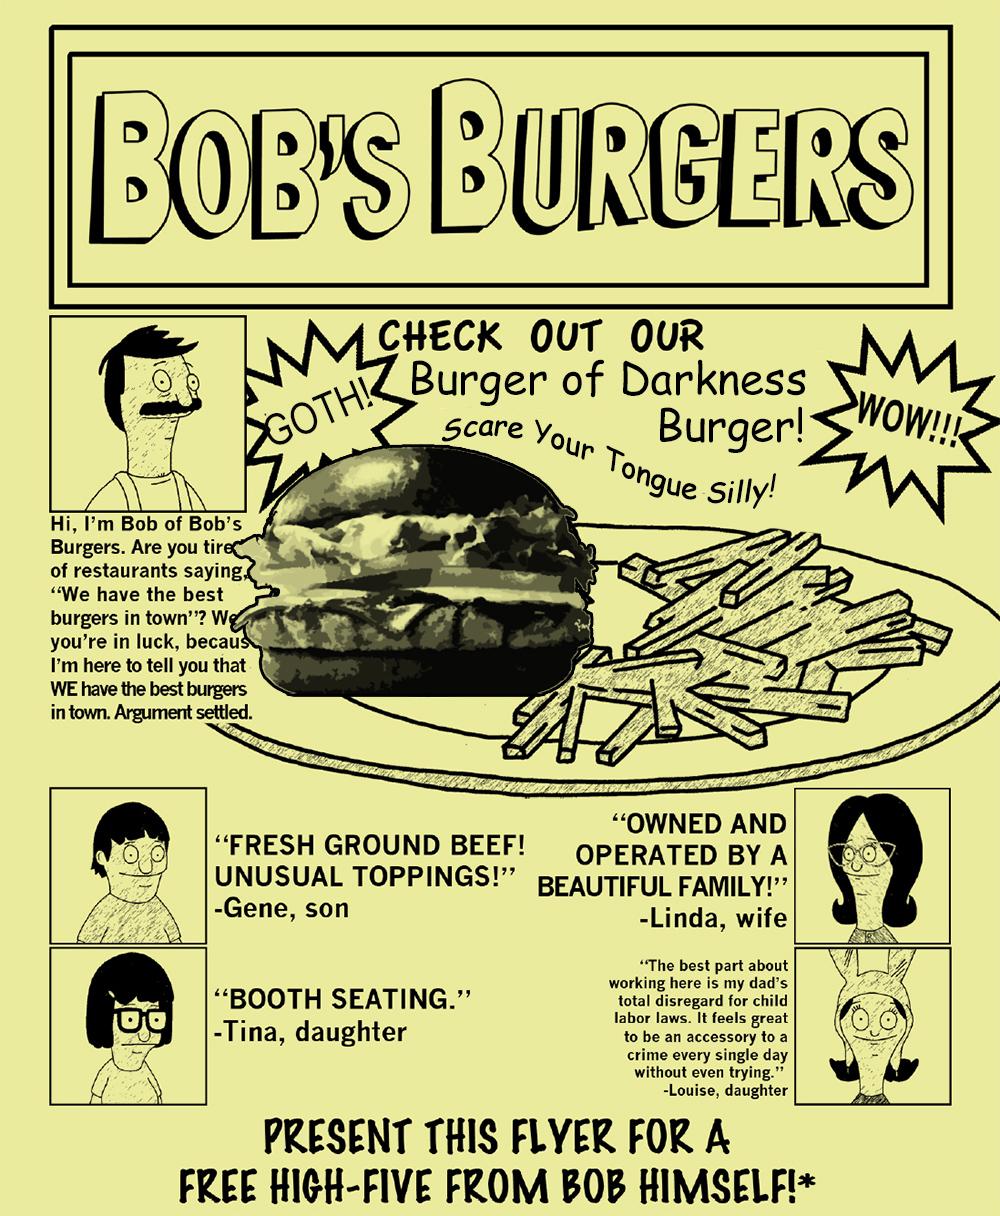 burger-of-darkness